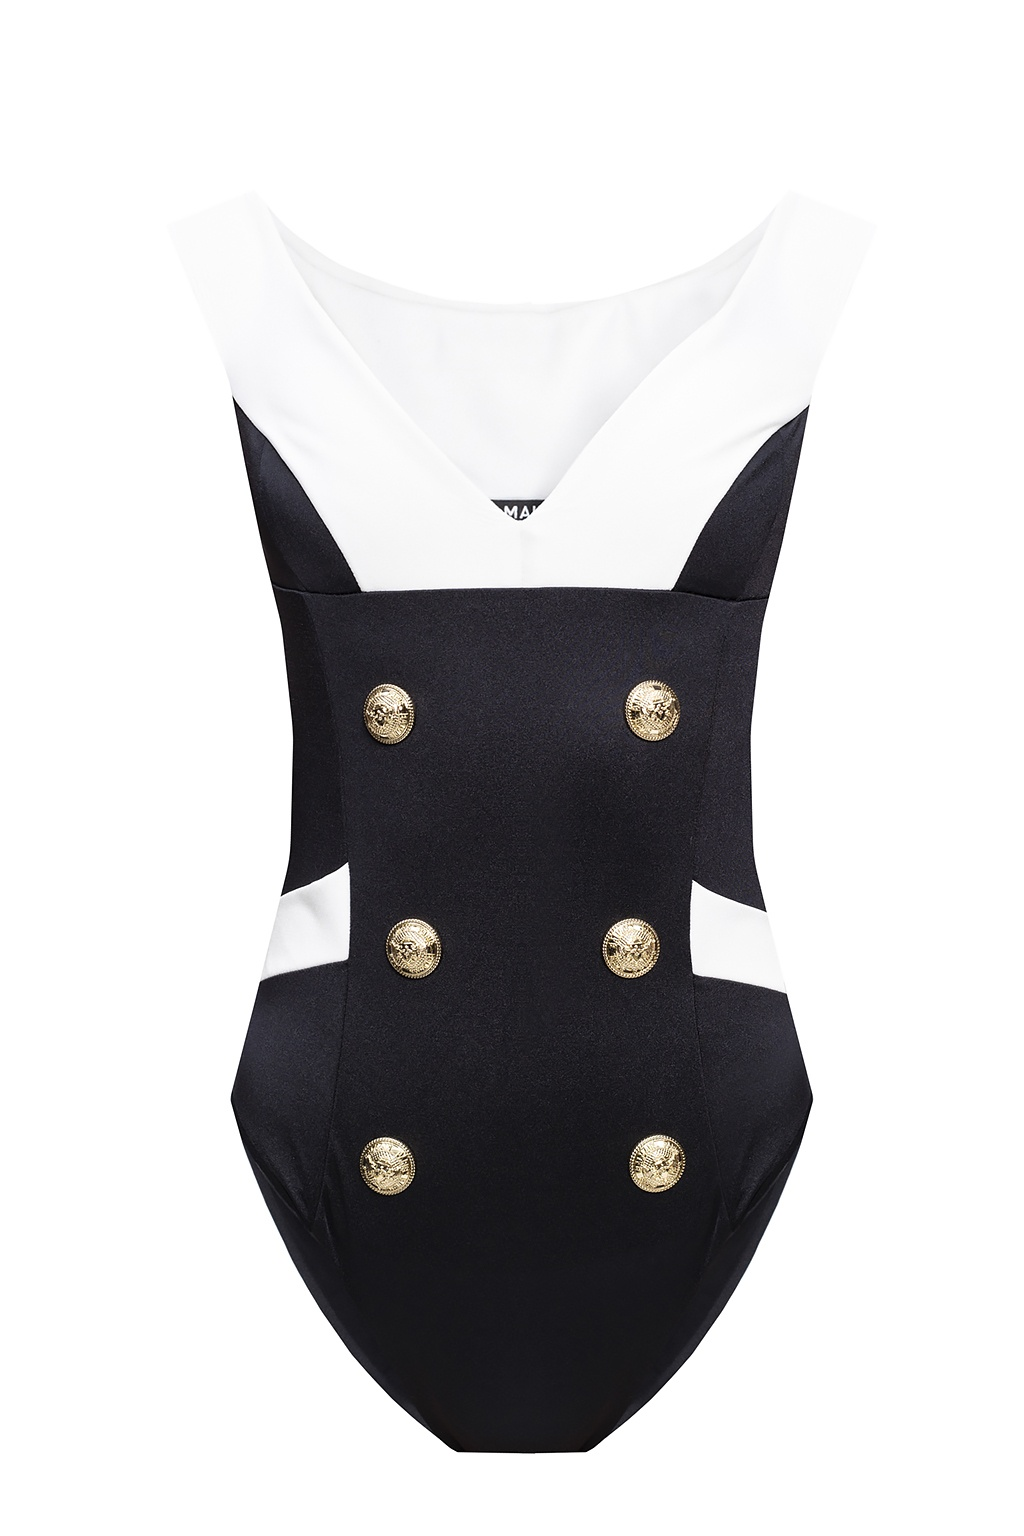 Balmain One-piece swimsuit